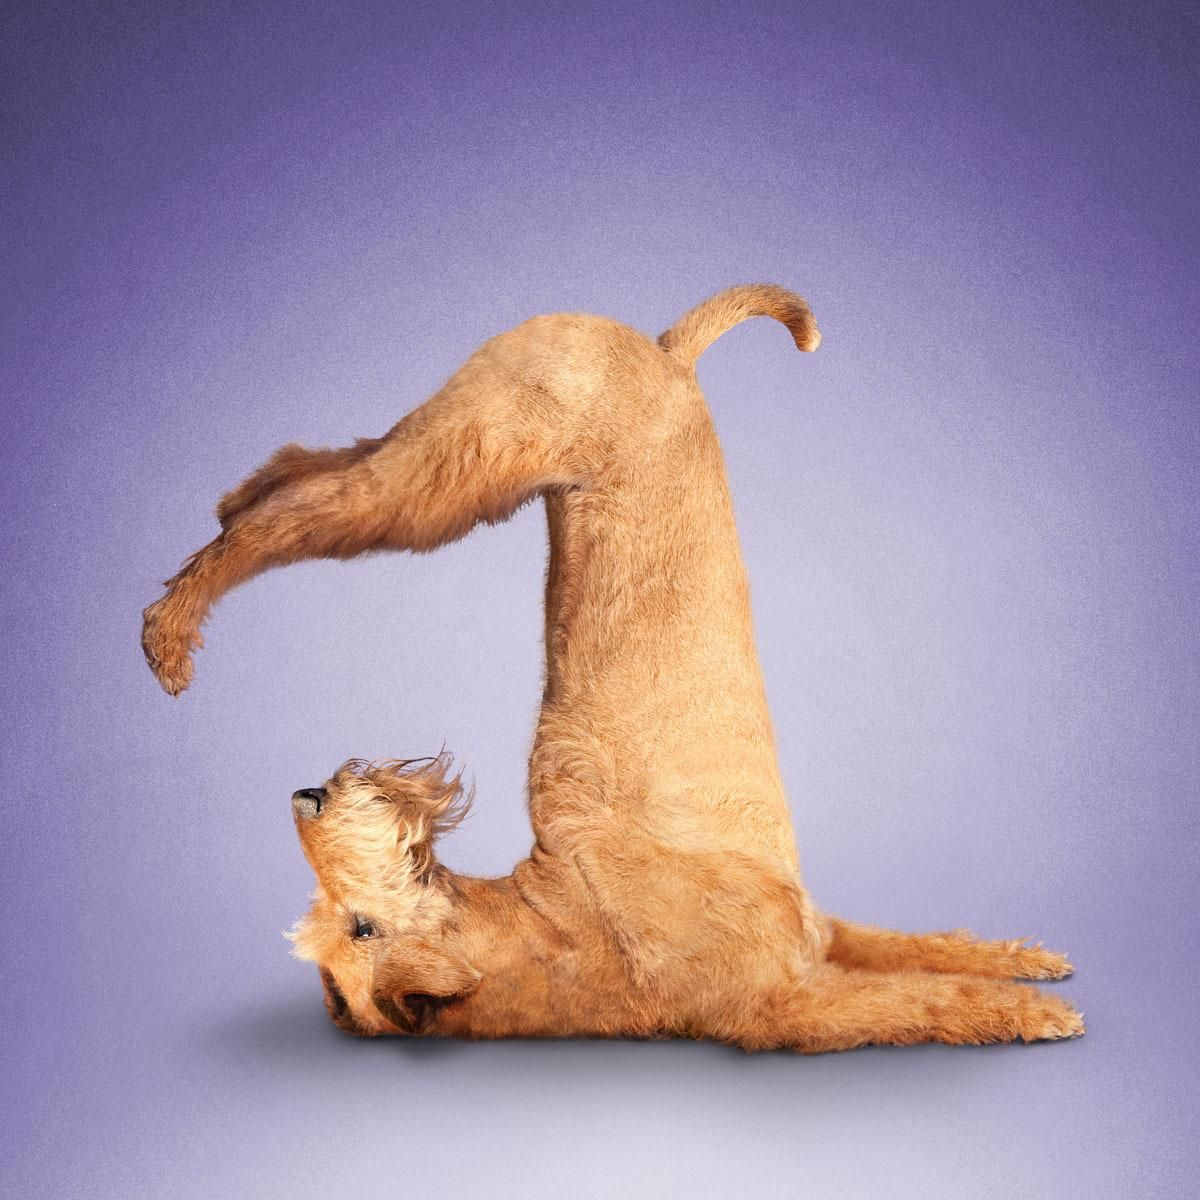 Bilderesultat for yoga dog funny tazz